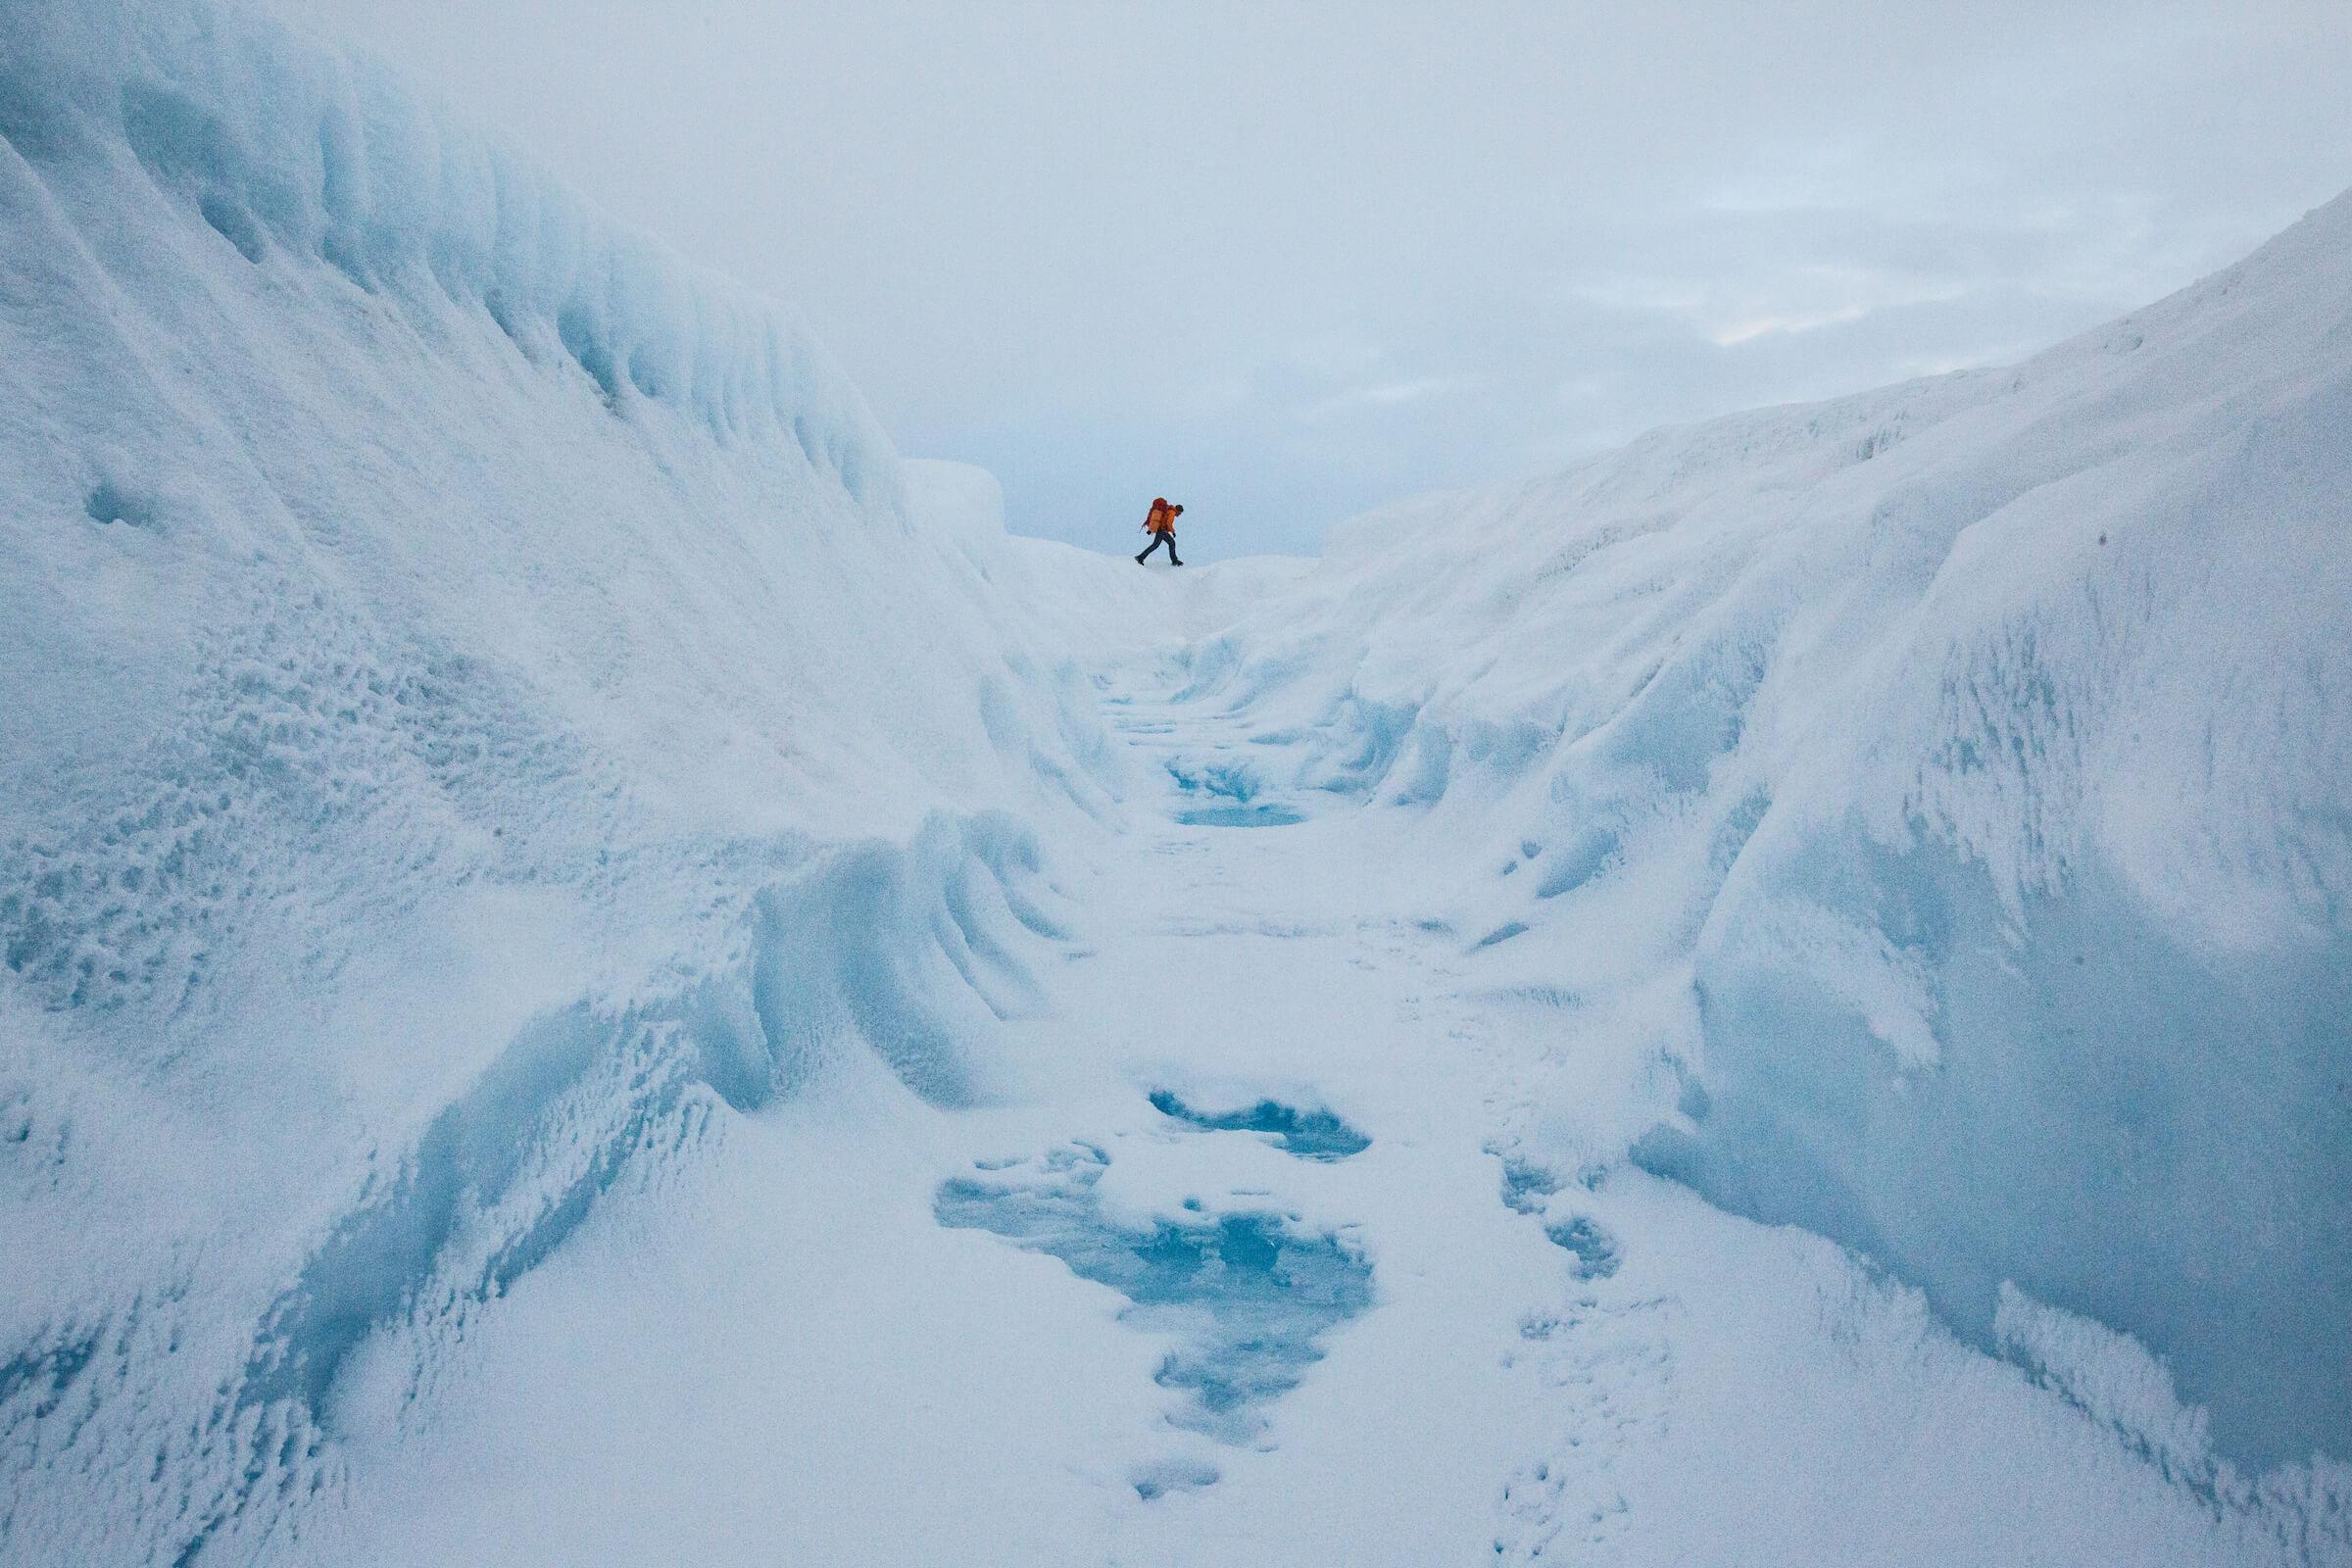 A glacier walking adventure by a crevasse on the Greenland Ice Sheet near Kangerlussuaq. By Paul Zizka